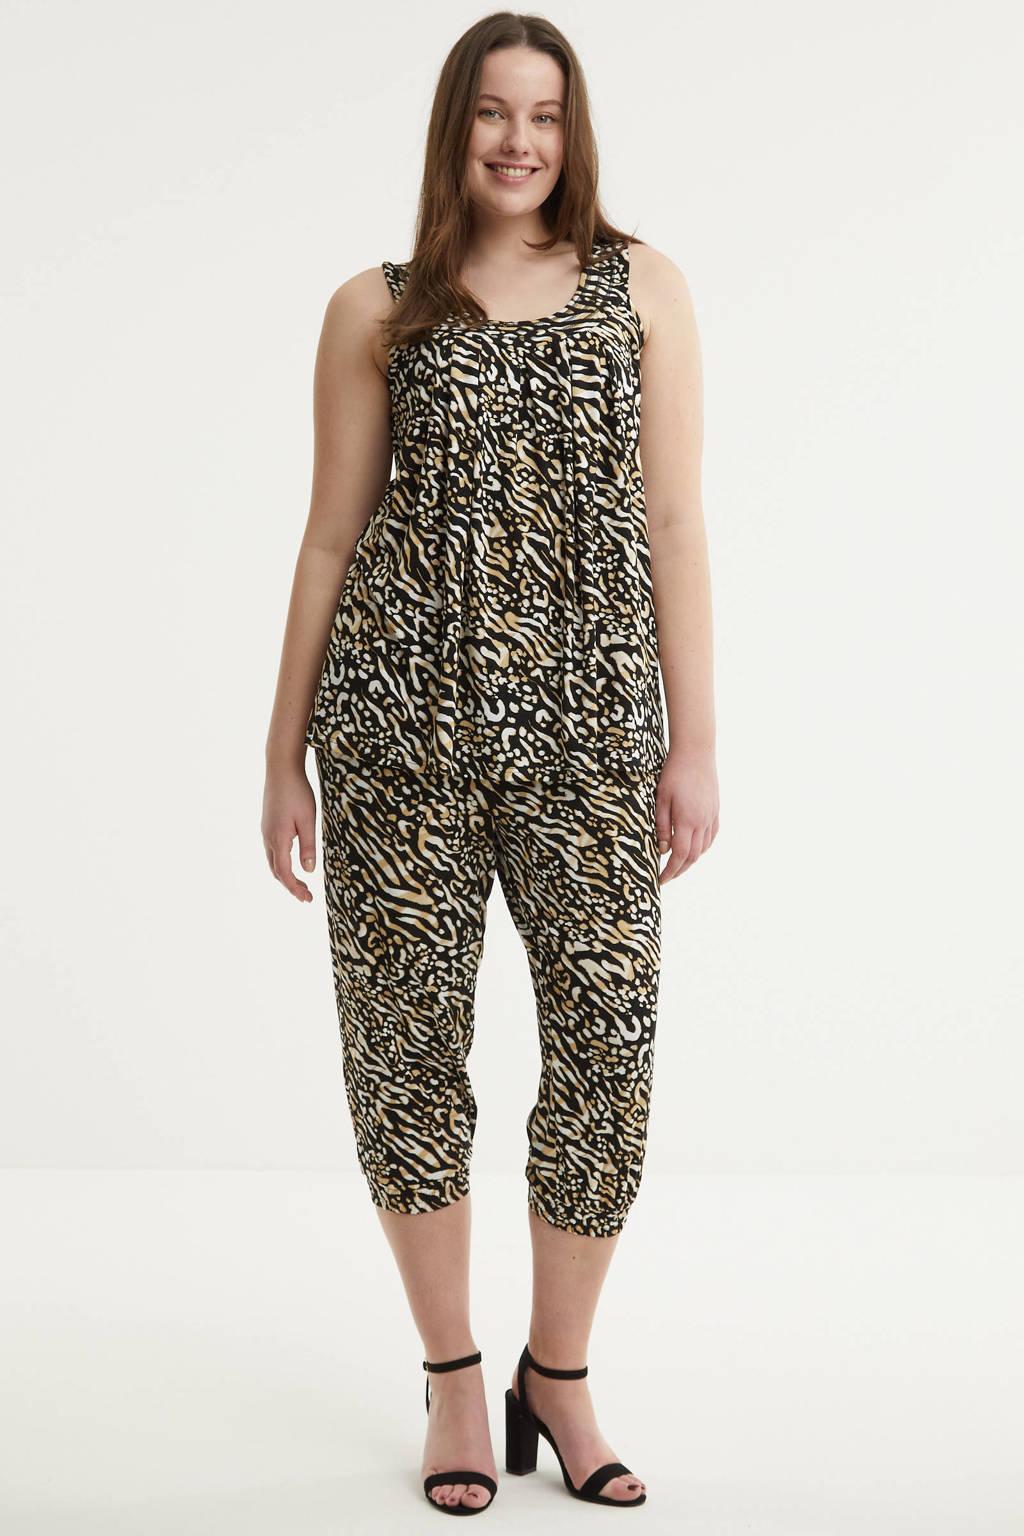 Zhenzi high waist loose fit capri ERIE 226 met all over print zwart/beige, Zwart/beige